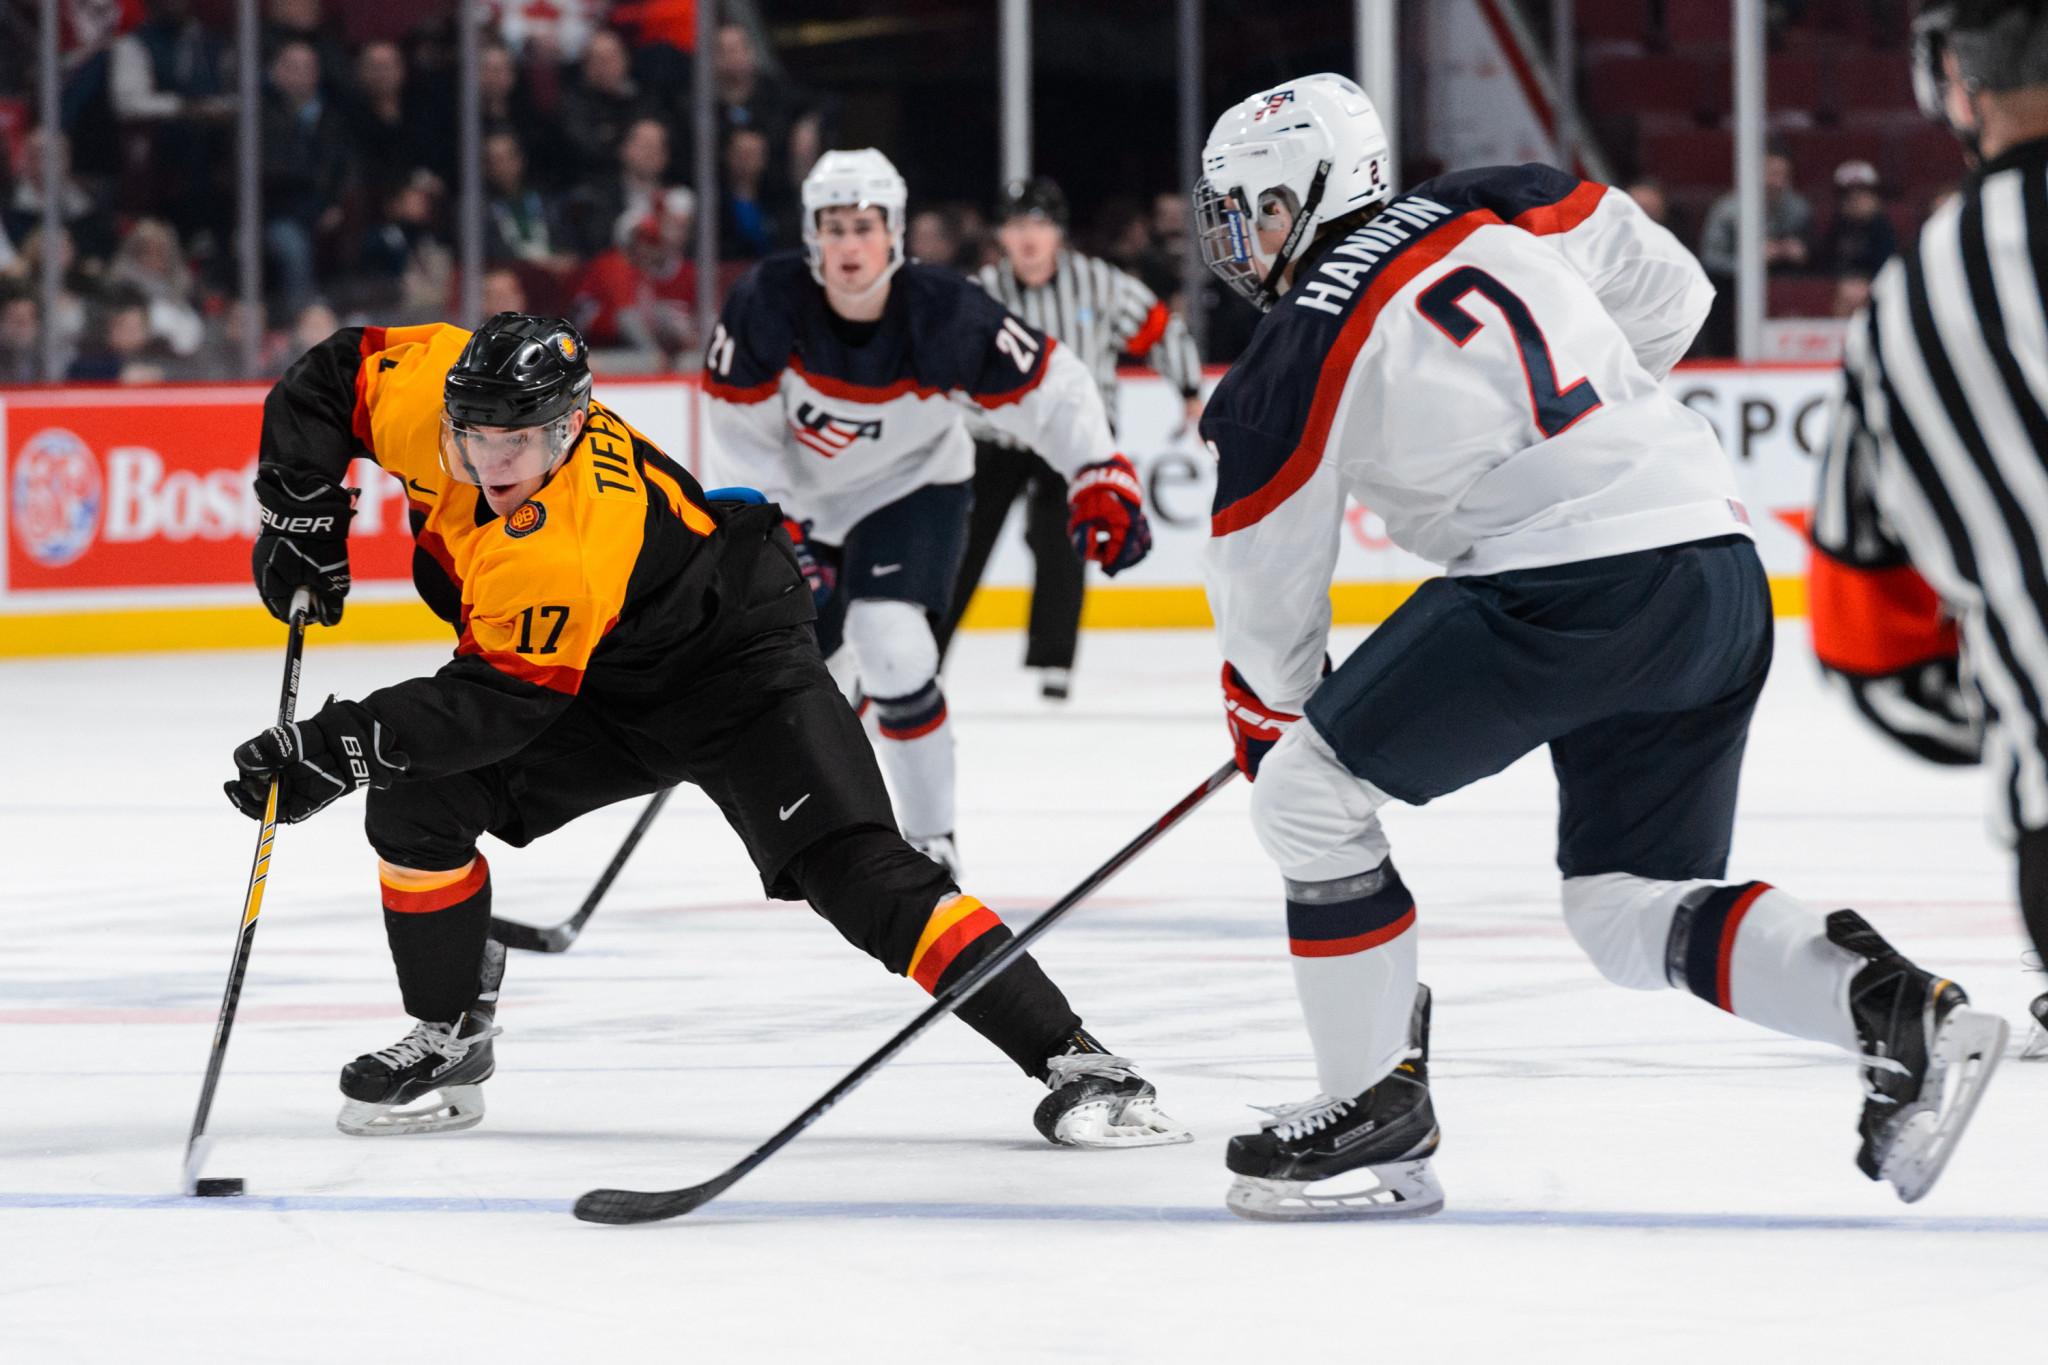 IIHF reports 10 COVID-19 cases among World Junior Championship teams